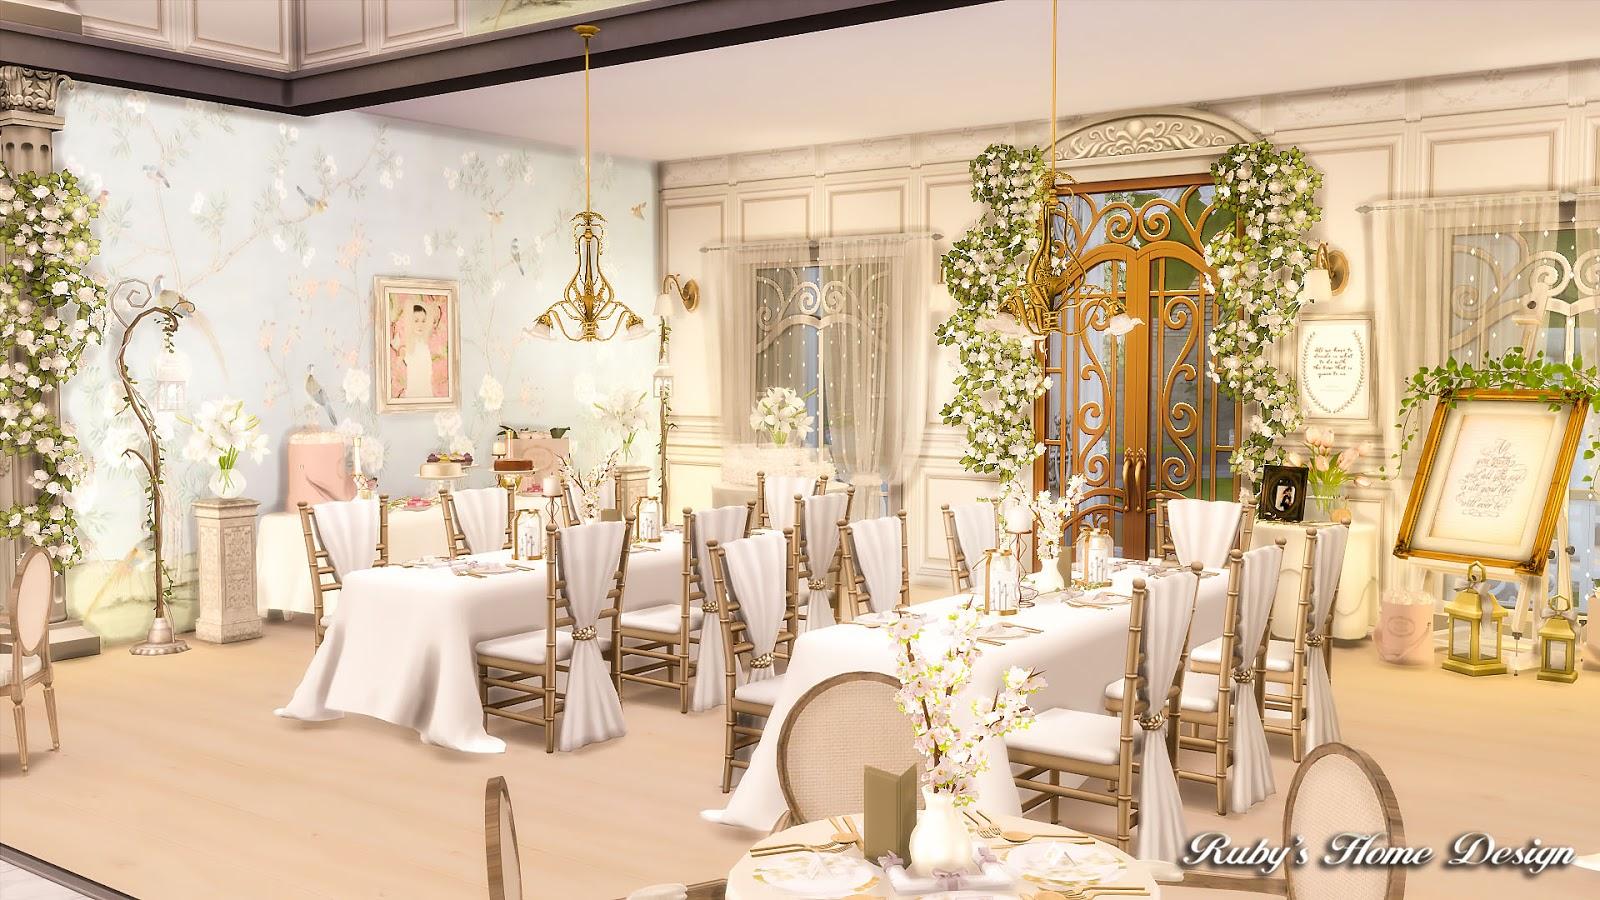 Sims 4 Von Haunt Estate Wedding Venue 浪漫莊園婚禮 [ Ruby's Home ...